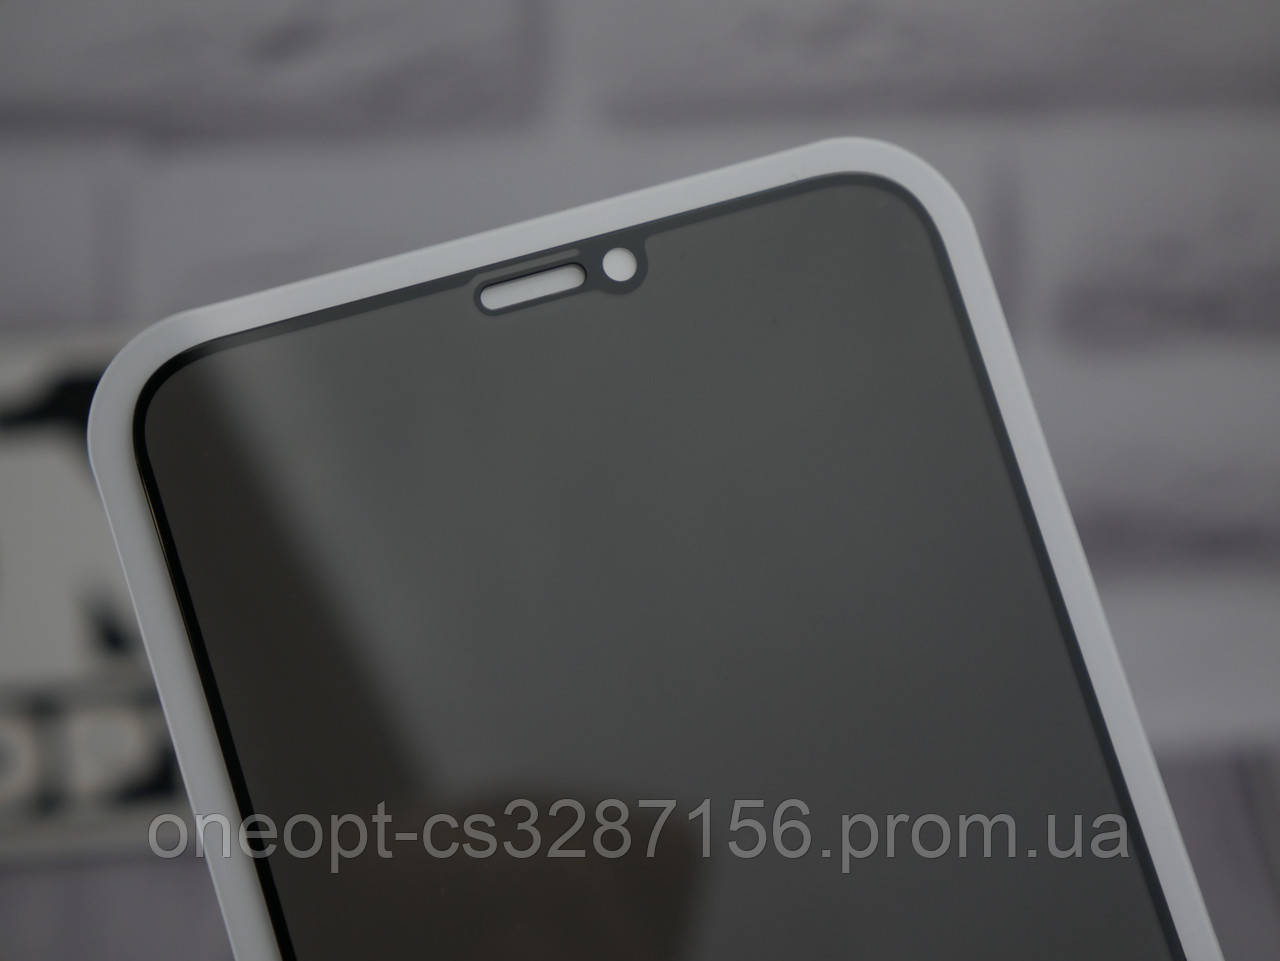 Захисне скло 3D Strong антишпигун iPhone XS Max/11 Pro Max Black